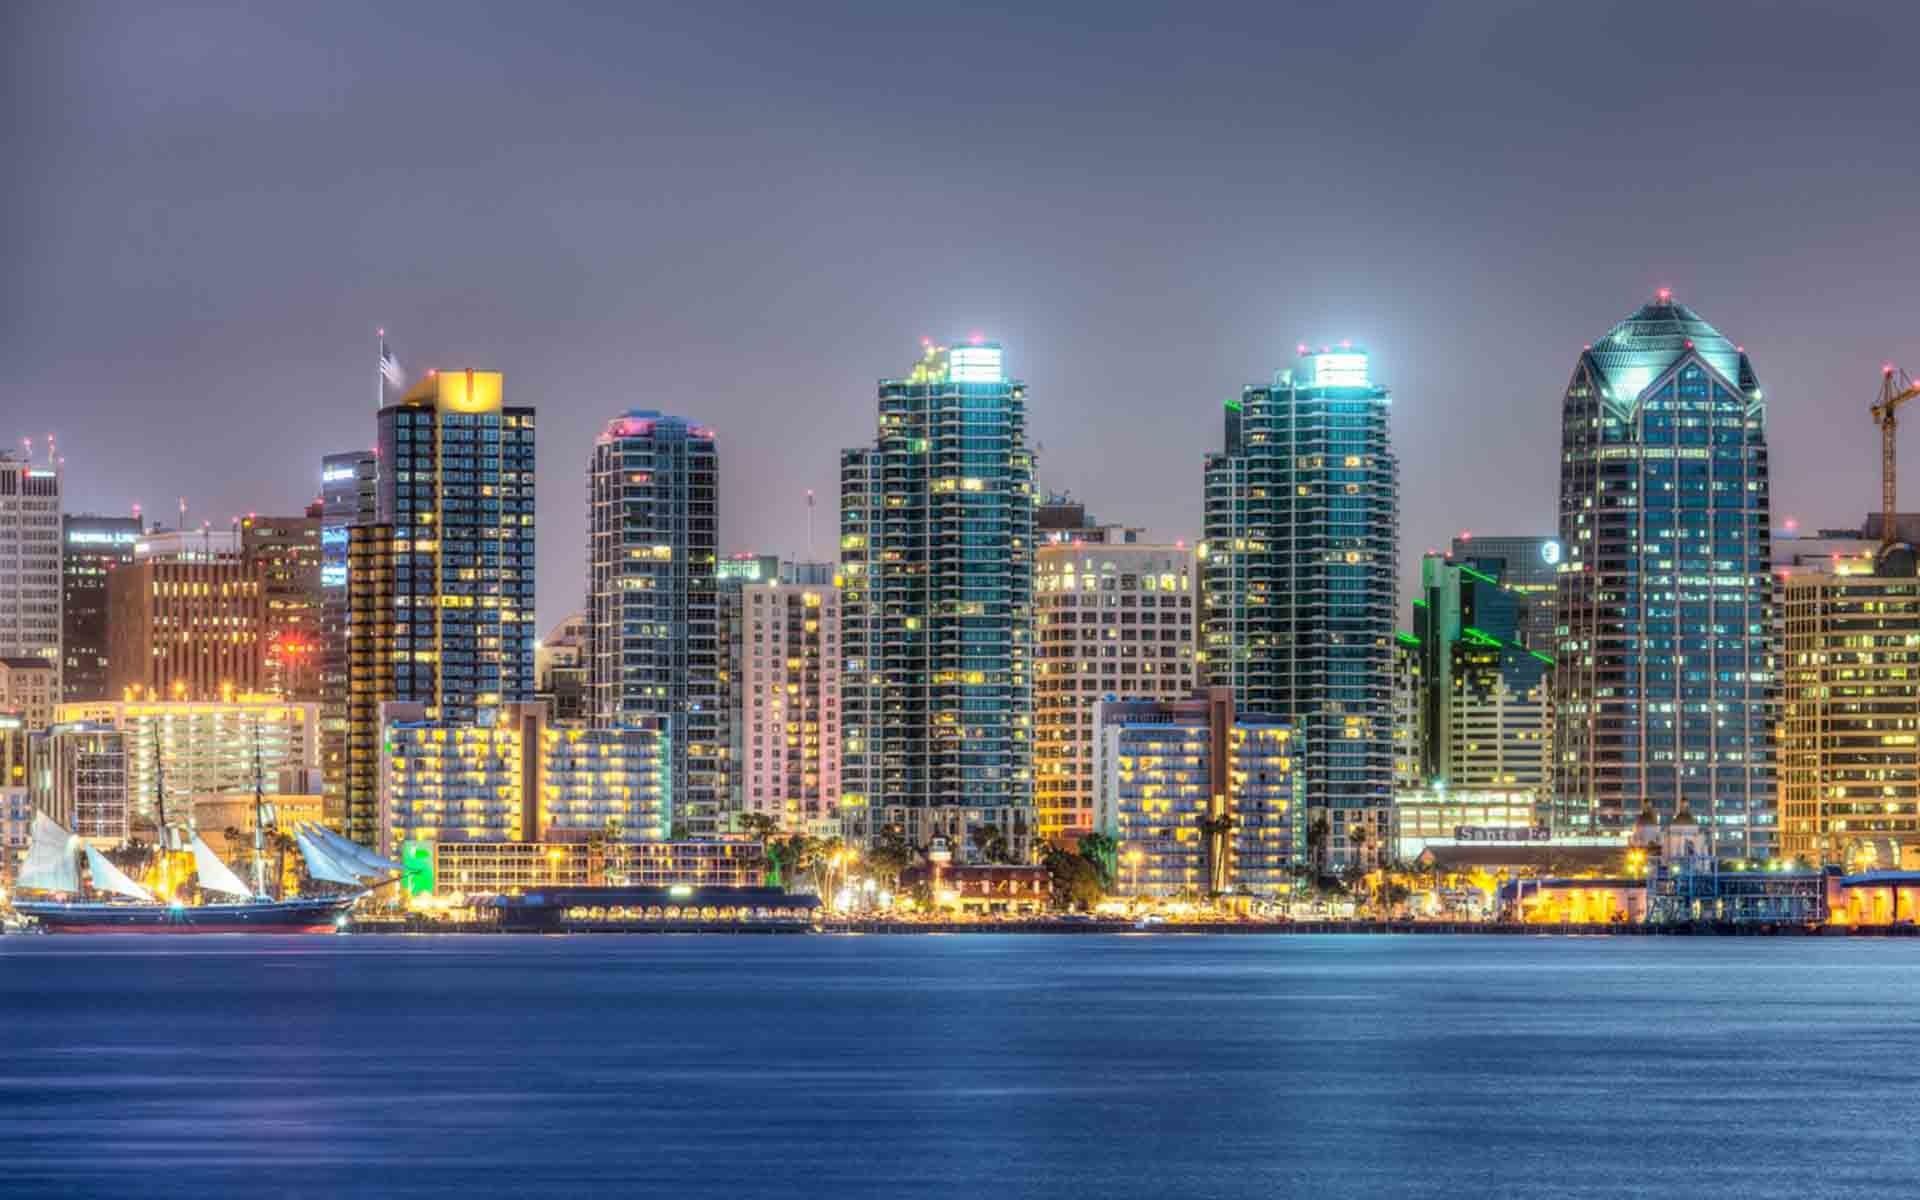 San Diego Skyline Wallpapers Â« Beach & Travels Â« HD Wallpapers